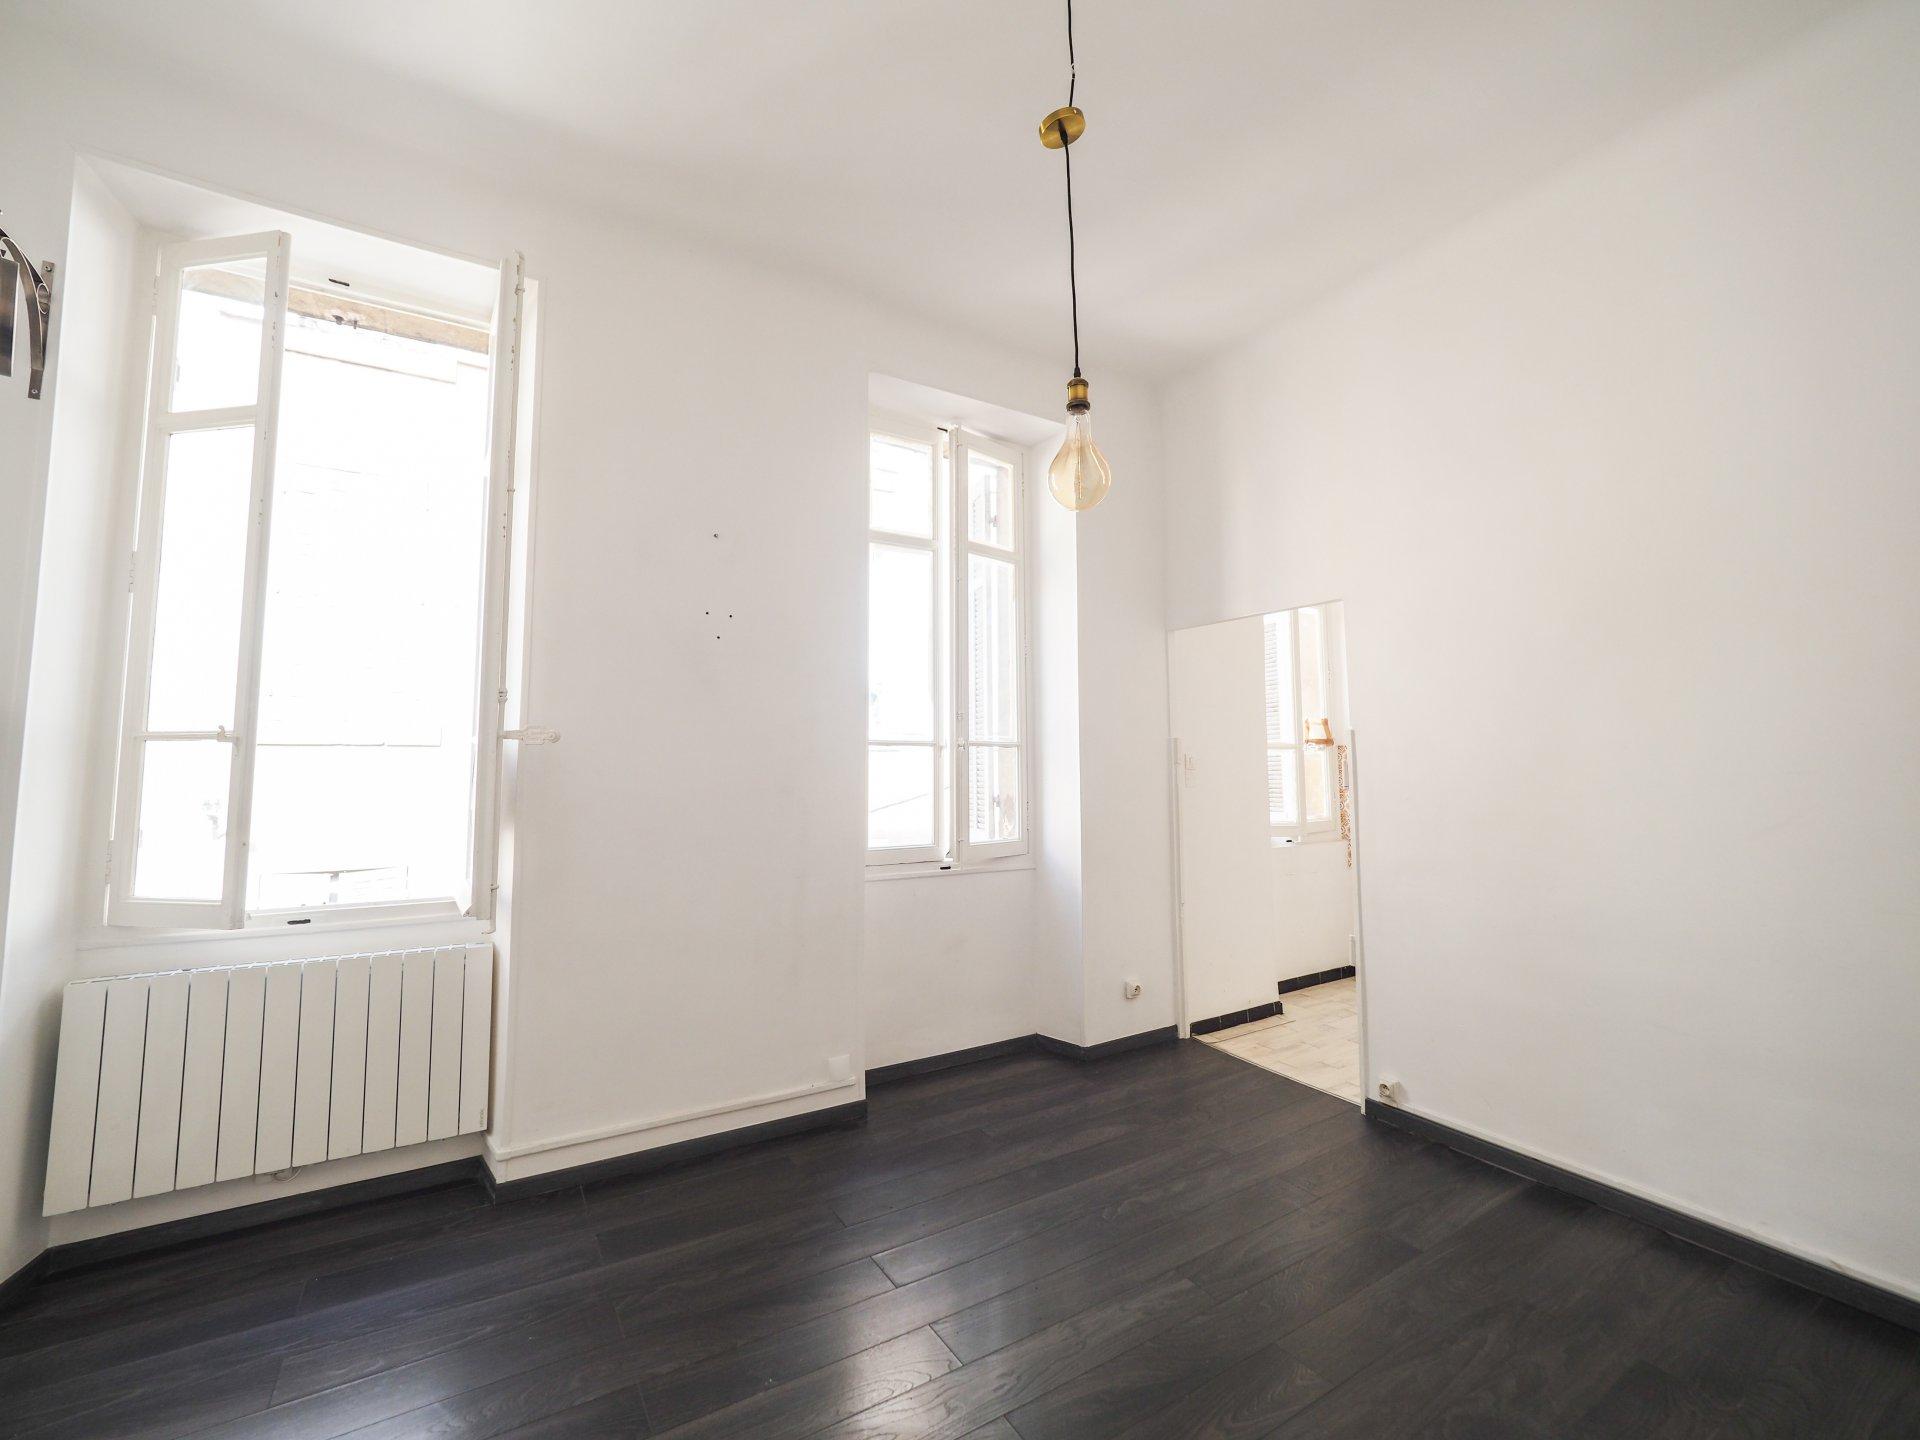 Affitto Appartamento - Marseille 8ème Périer